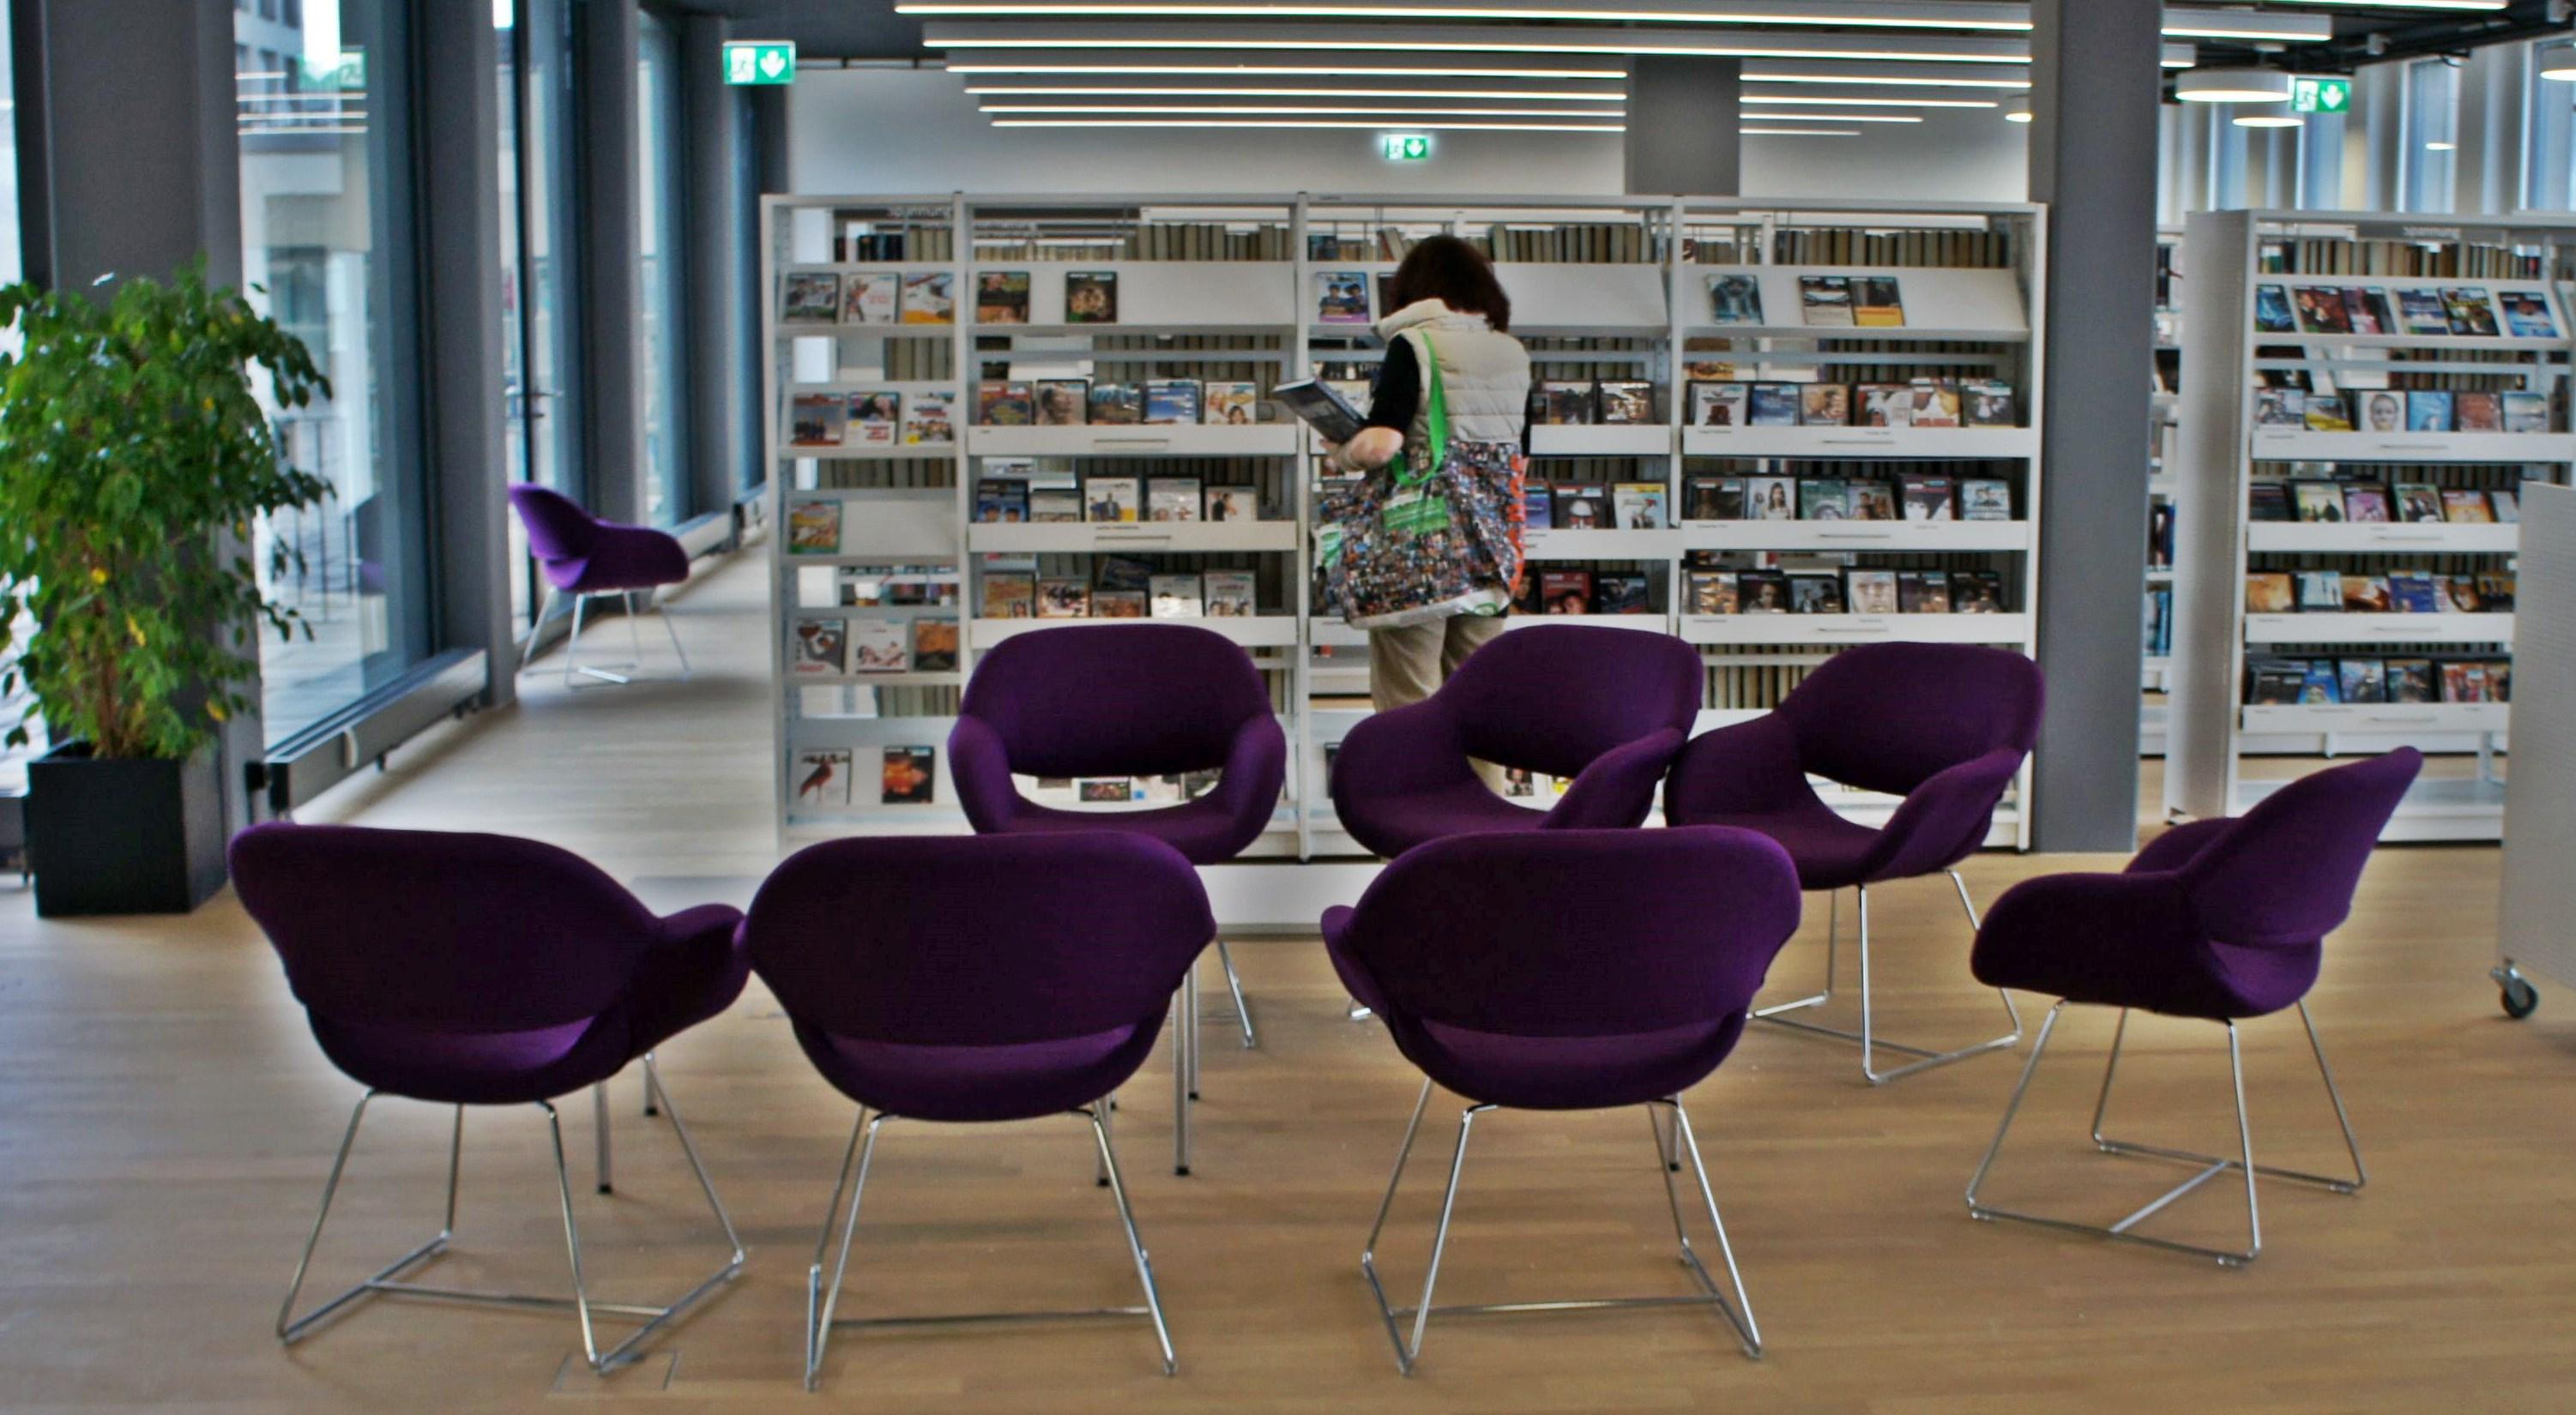 Bild Bibliothek